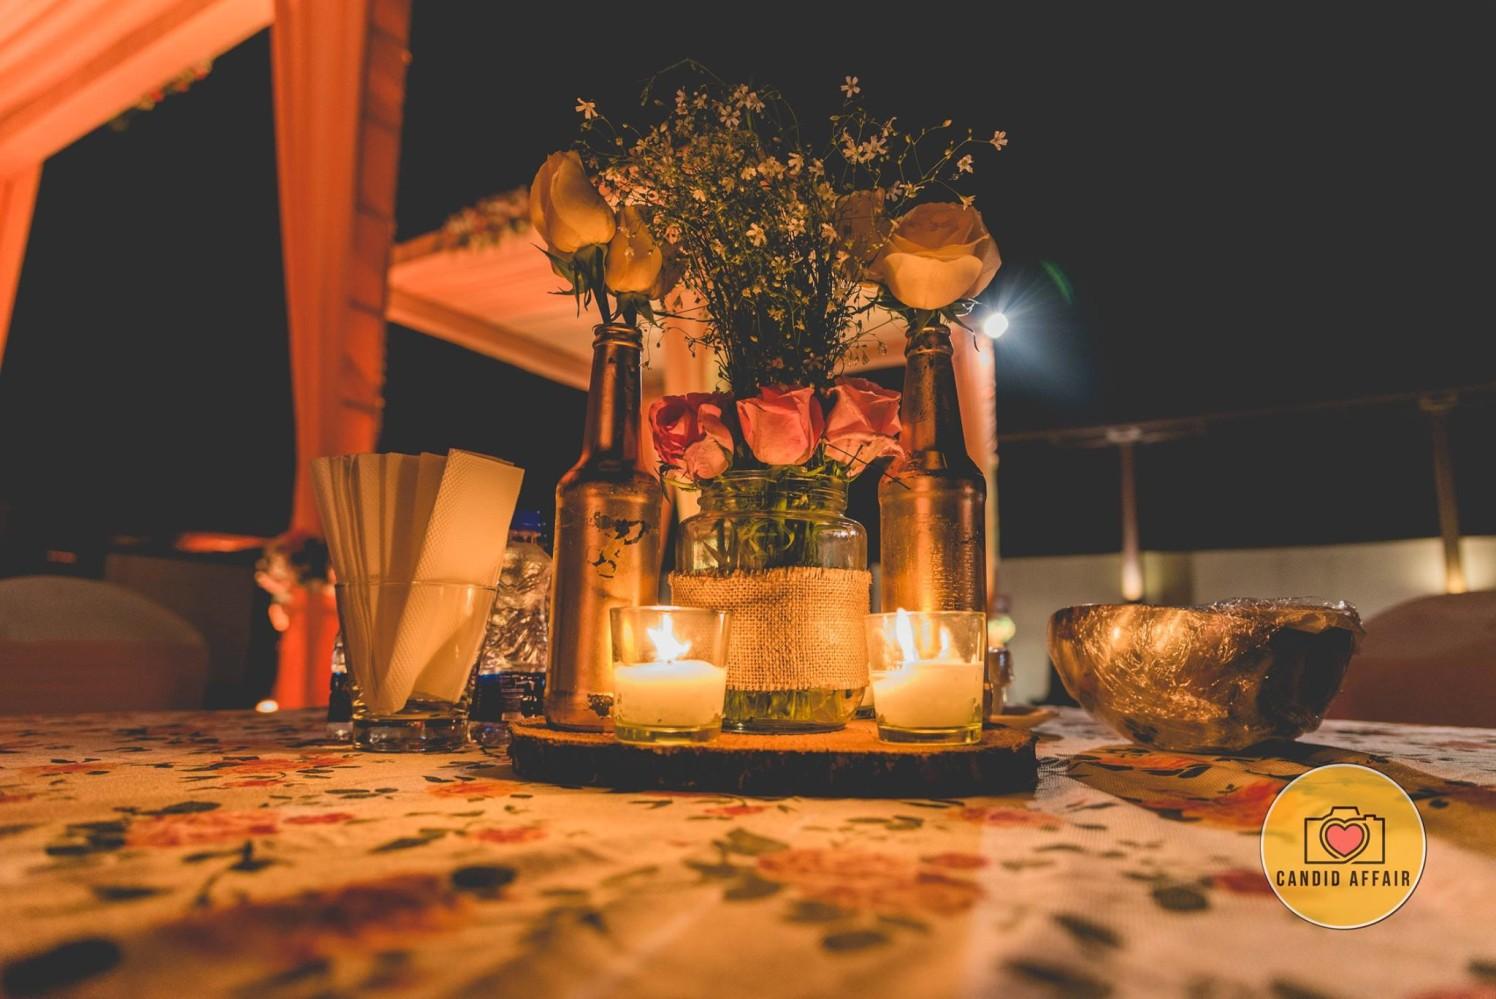 Candle And Roses Wedding Decor by Candid Affair Wedding-decor | Weddings Photos & Ideas